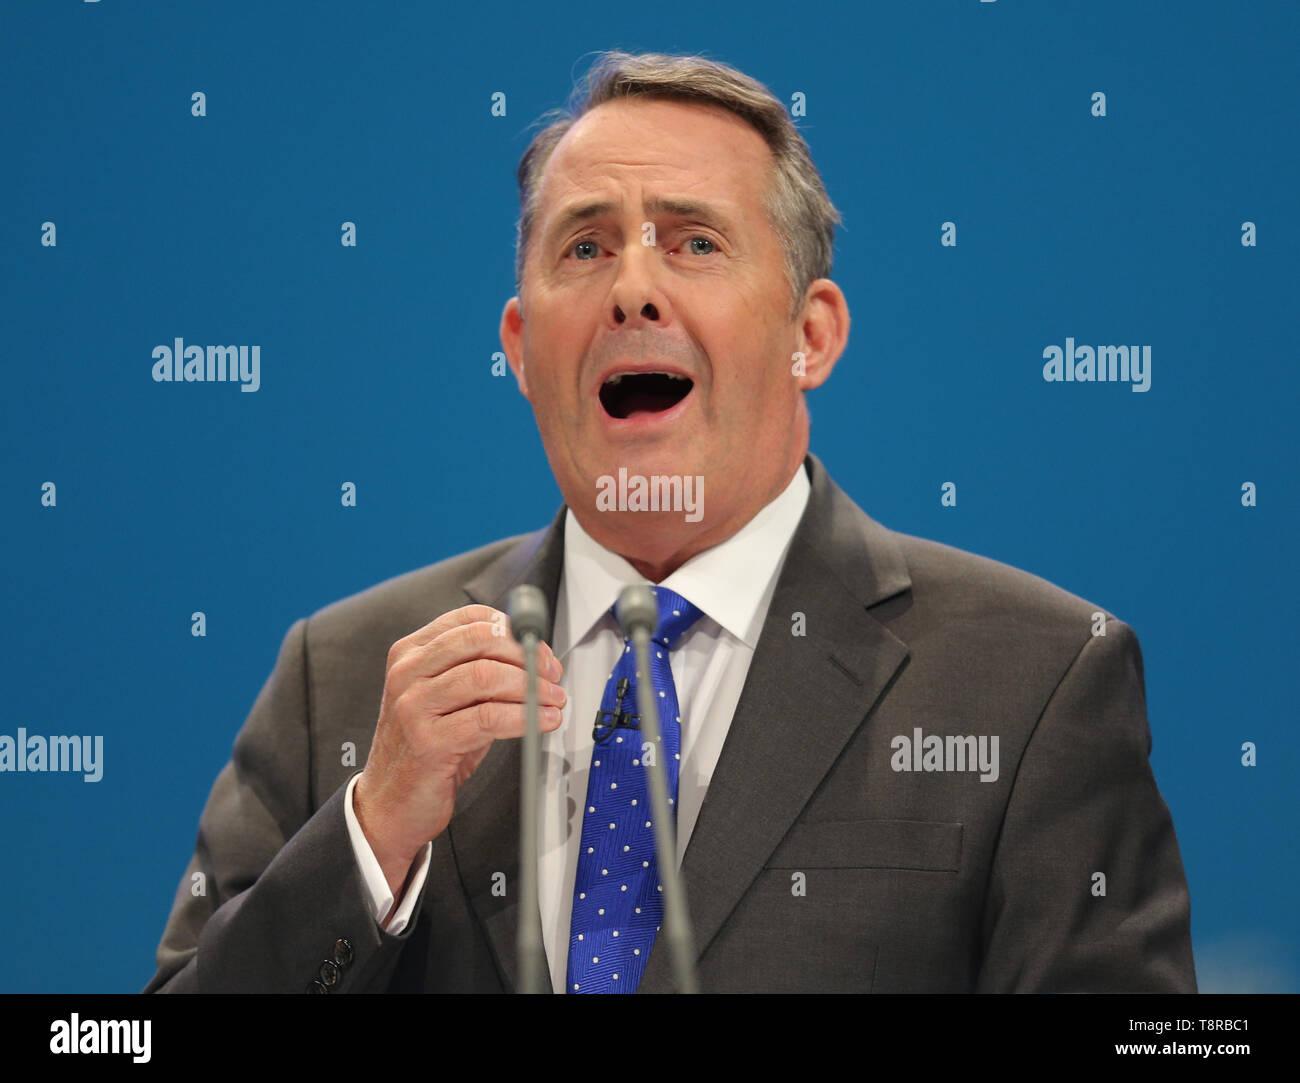 LIAM FOX MP, 2017 Stockbild